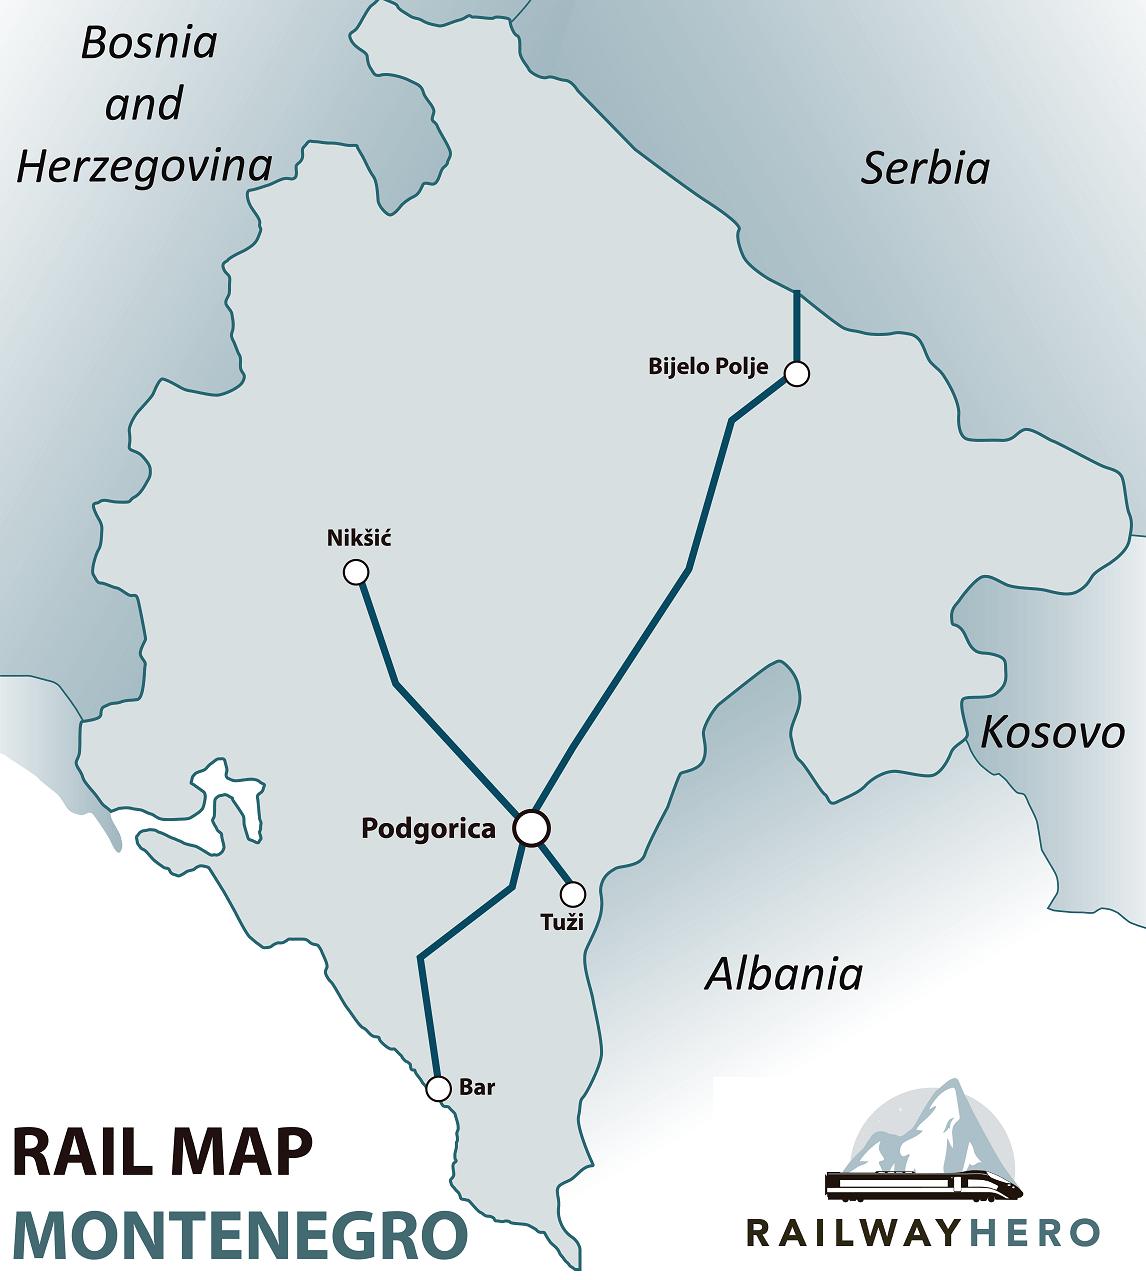 Montenegro rail map